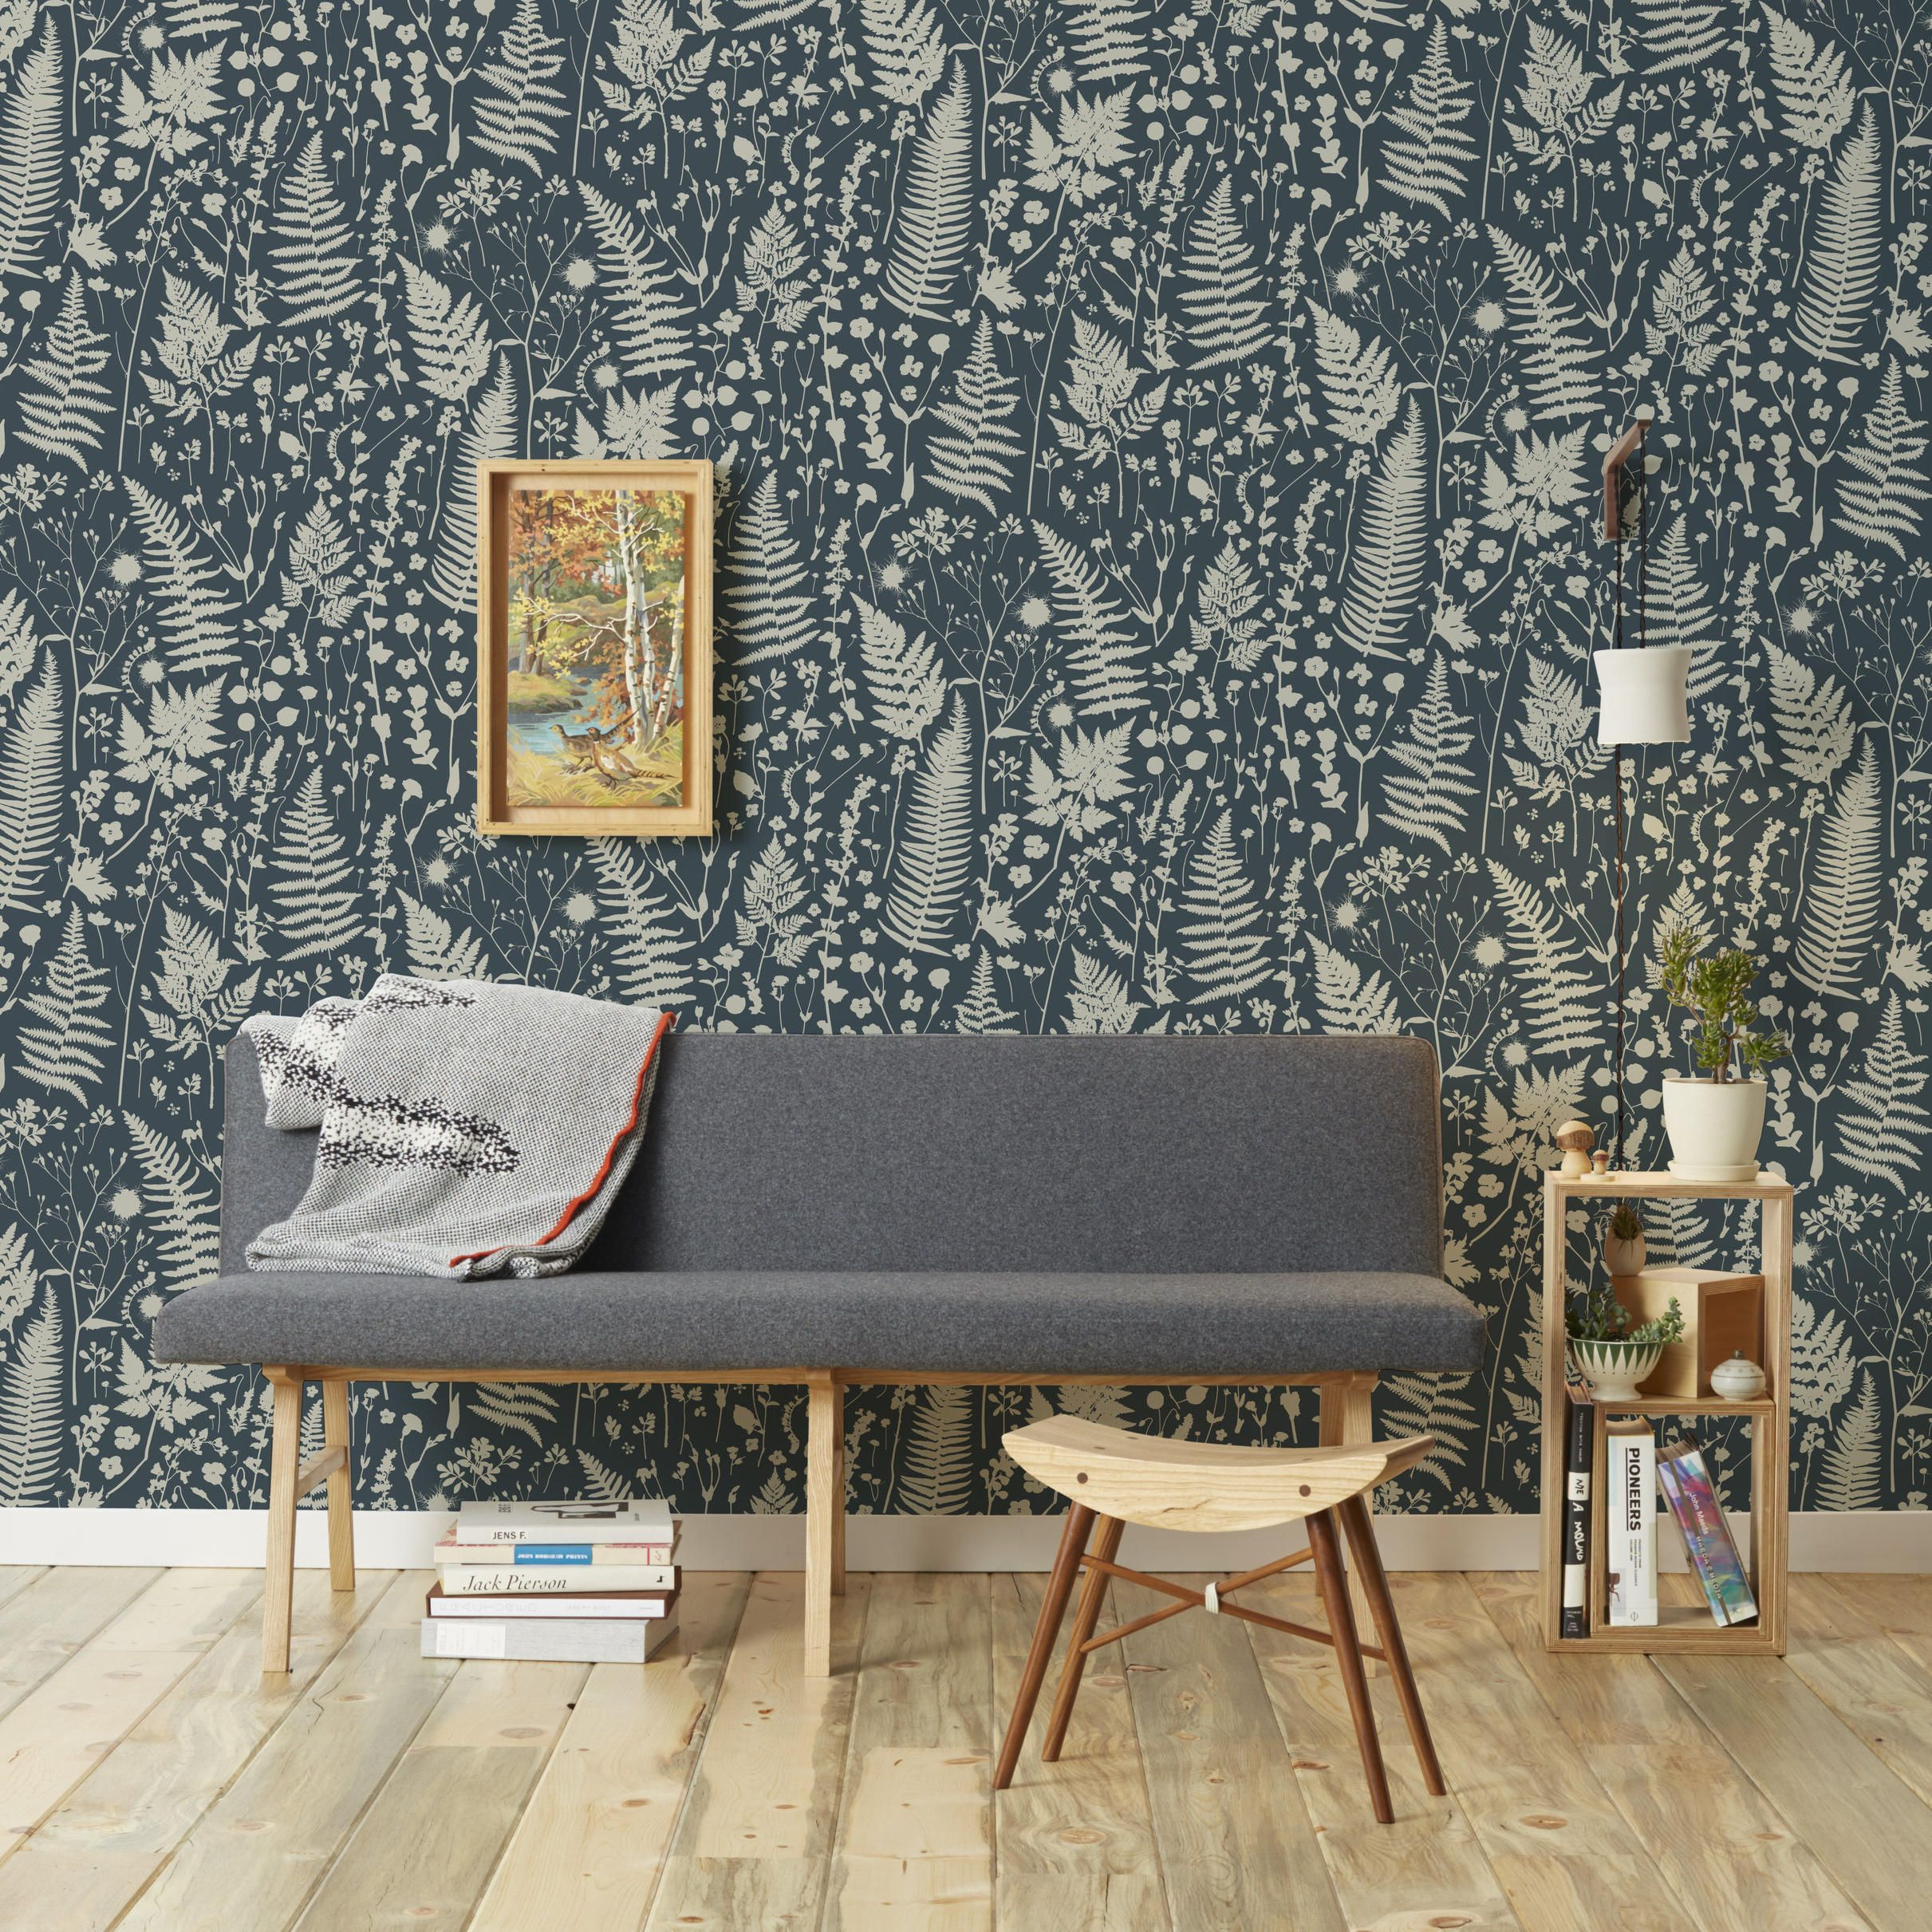 Le Papier Peint Est Il Recyclable forage hand-screened wallpaper | home decor, decor, colorful